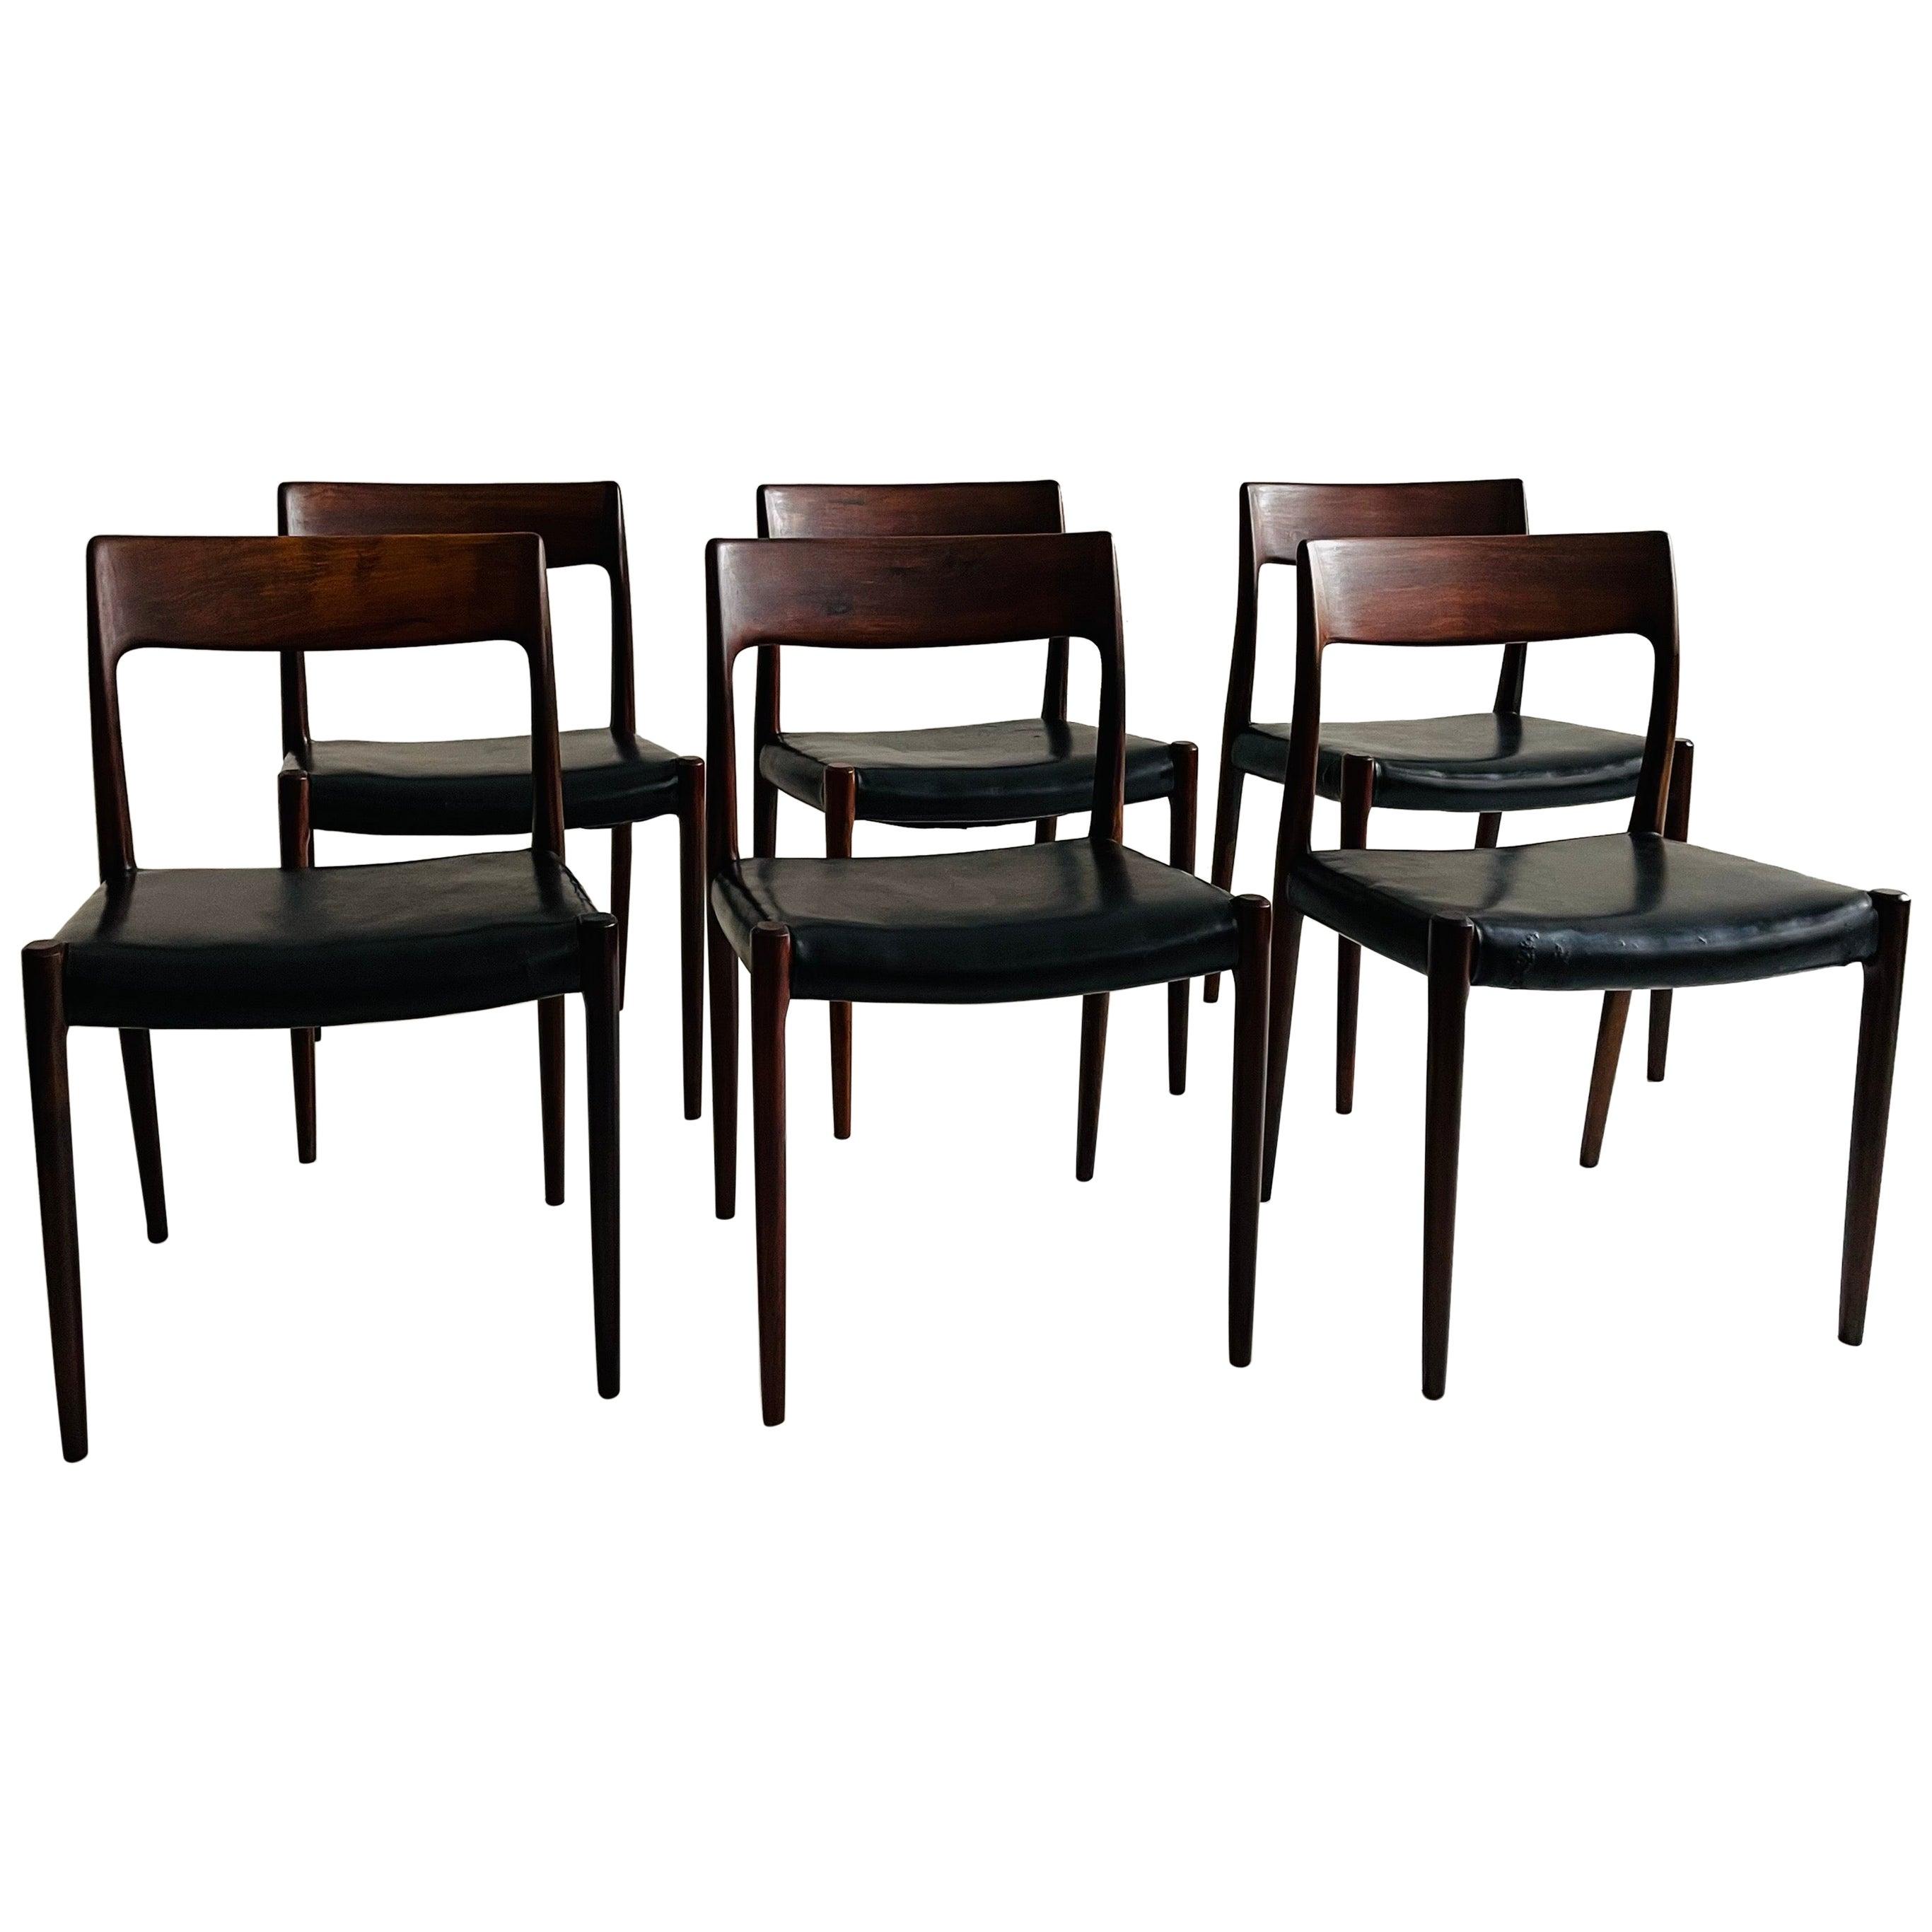 Niels O. Møller Dining Chairs No 77 Set of Six by Møllers Møbelfabrik in Denmark